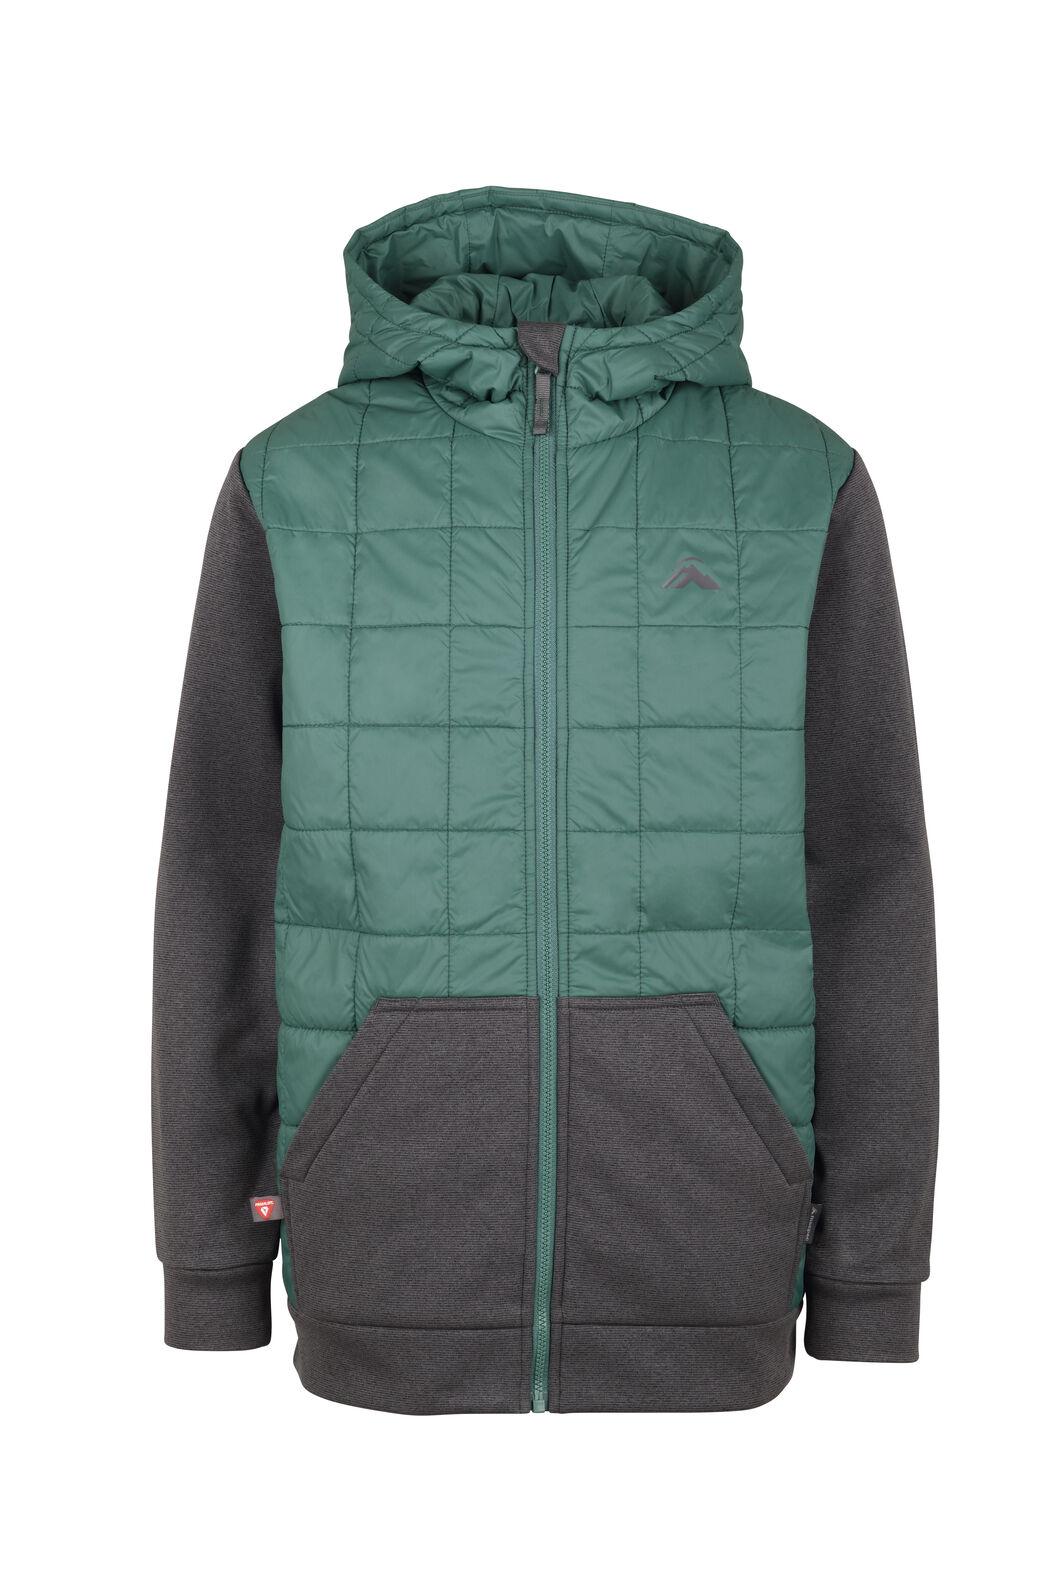 Macpac Campfire PrimaLoft® Hybrid Jacket - Kids', Bayberry/Asphalt, hi-res